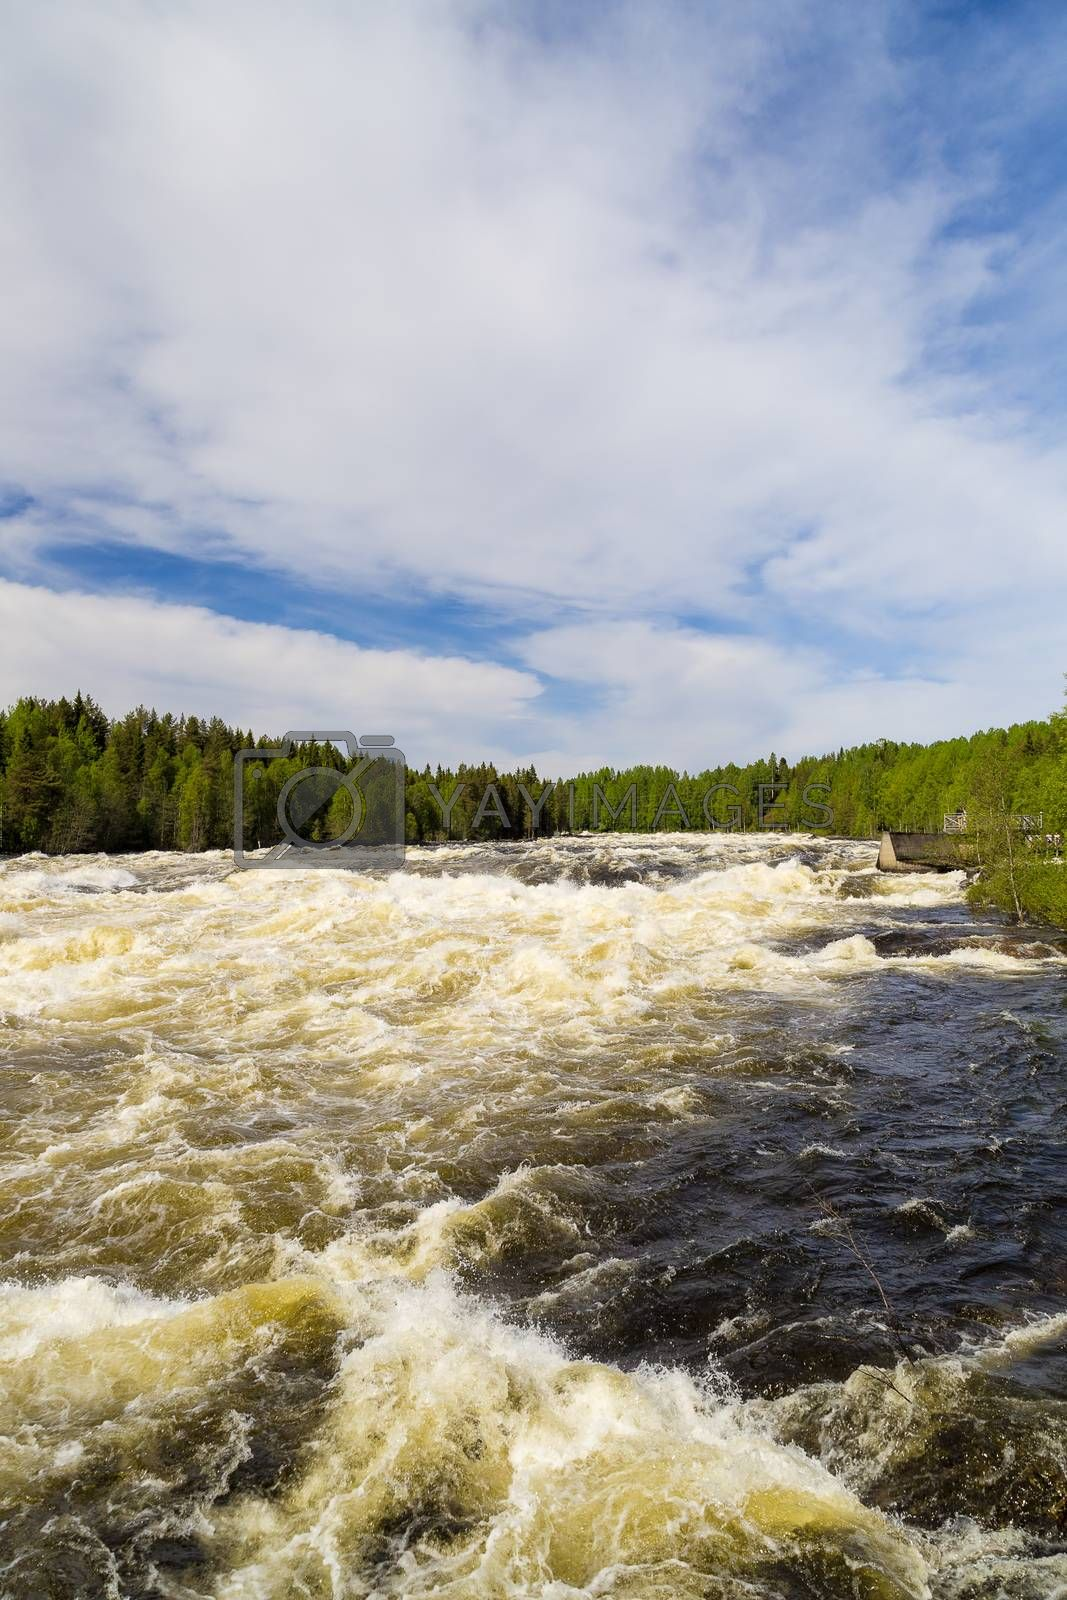 The rapids at Renforsen in Vindeln, Sweden by Emmoth